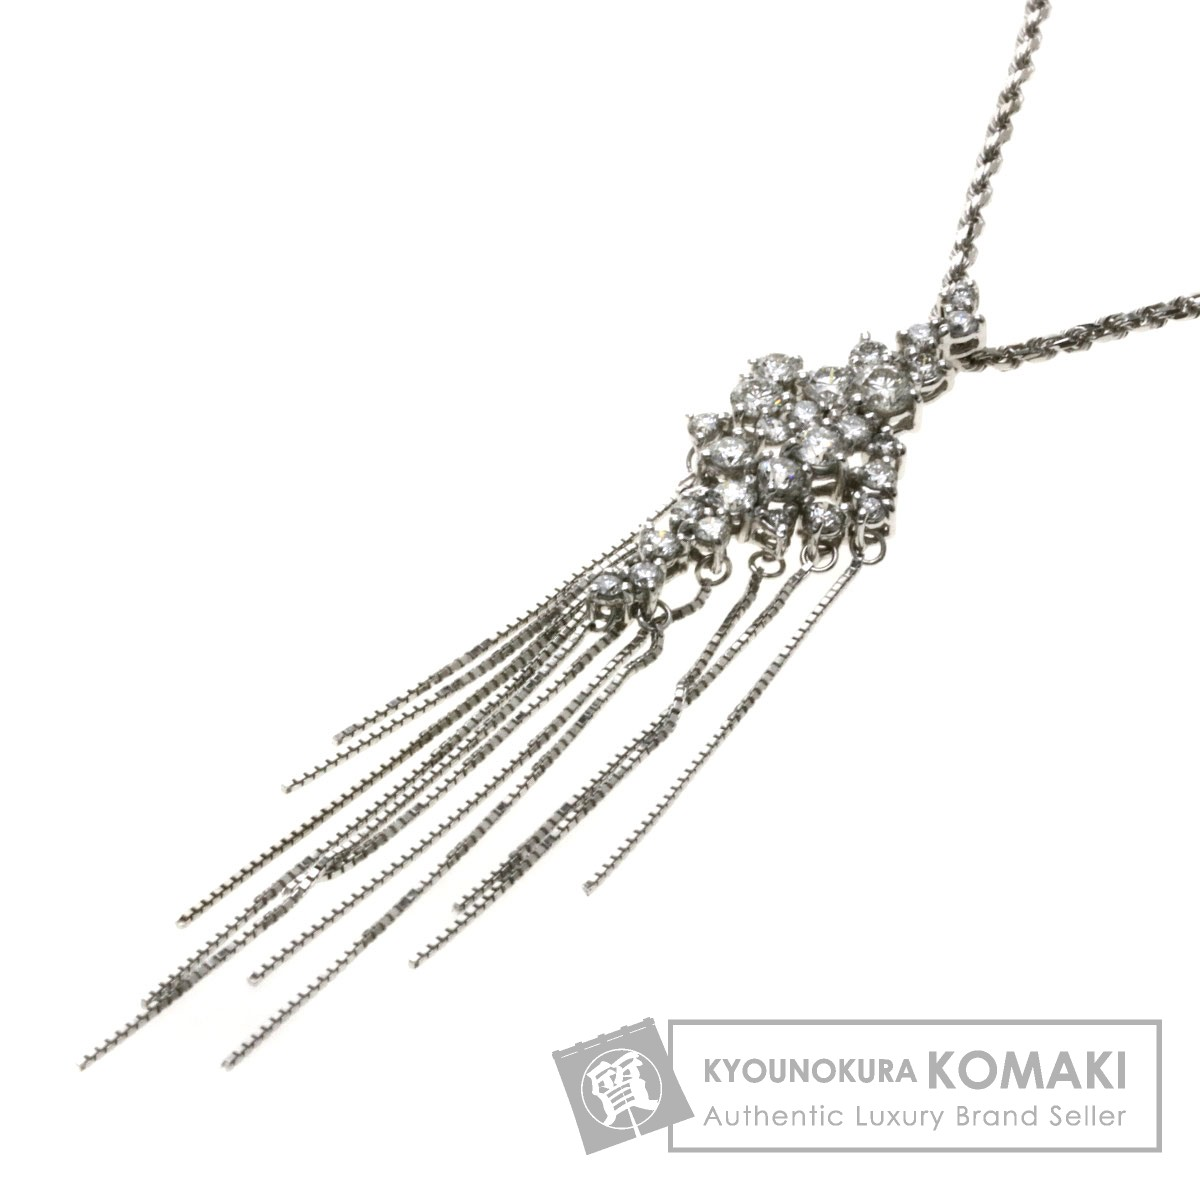 1ct ダイヤモンド ネックレス K18WG 7.7g レディース 【中古】